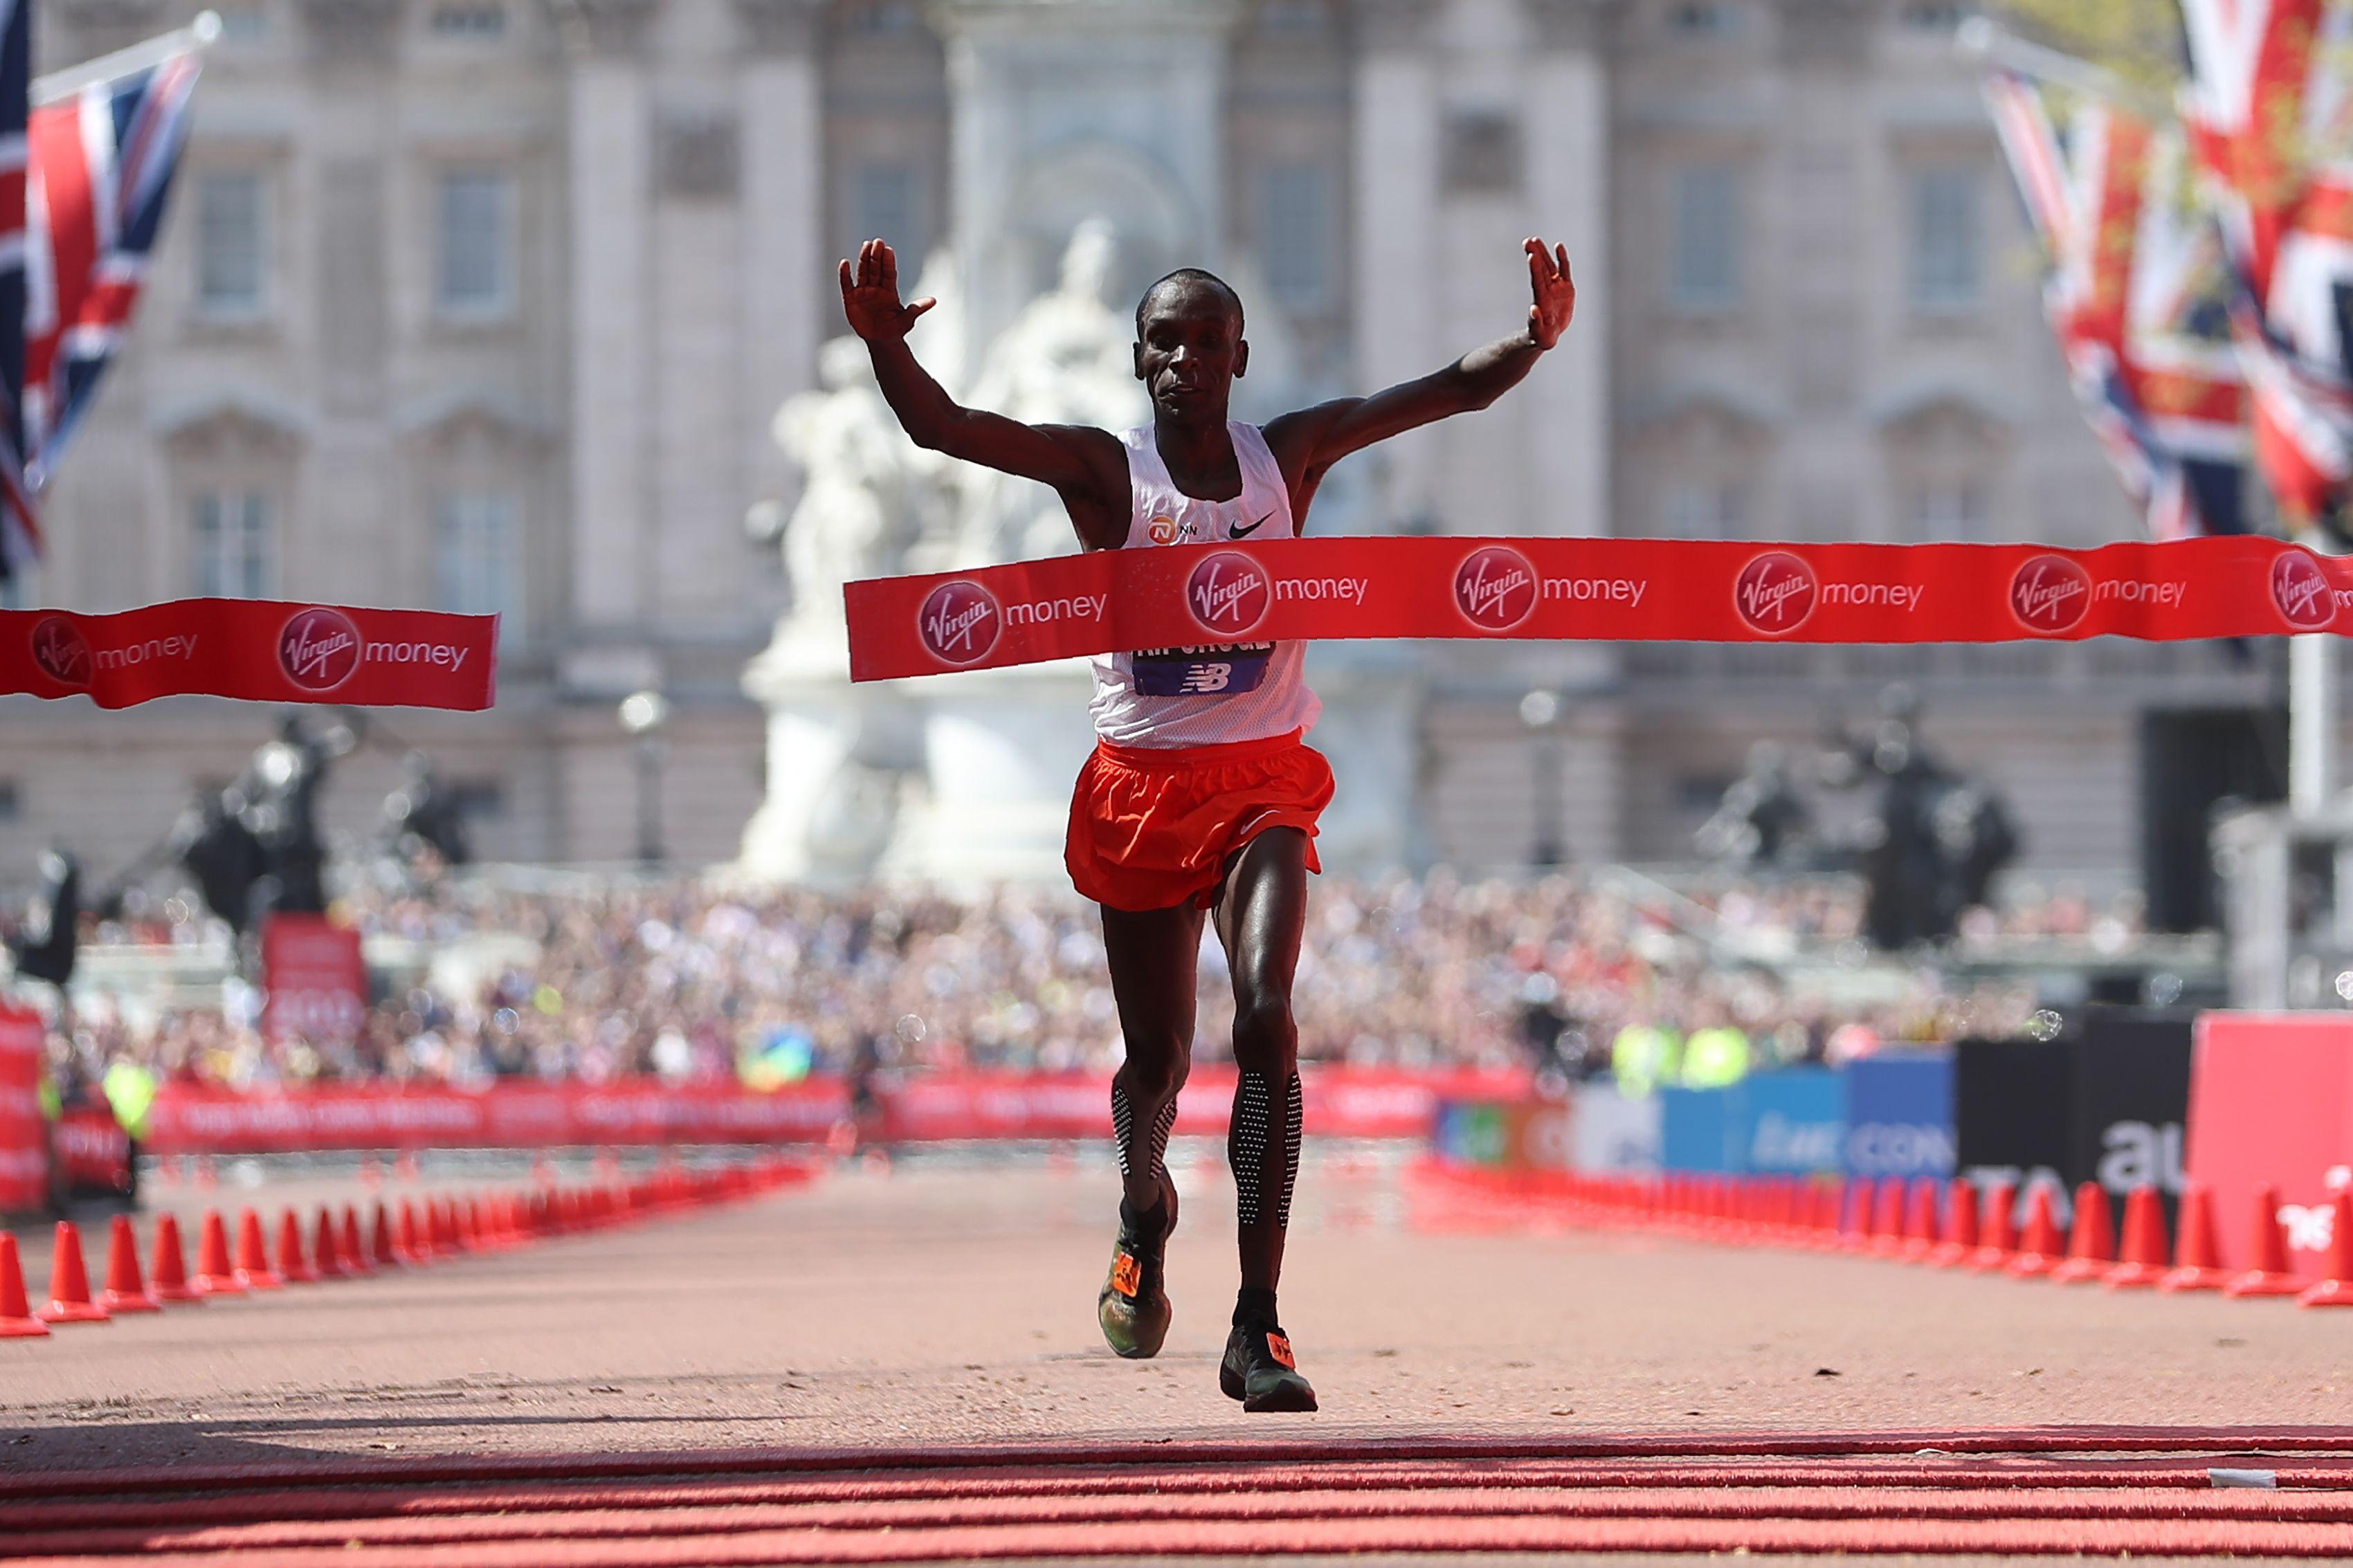 How to Watch the 2019 London Marathon